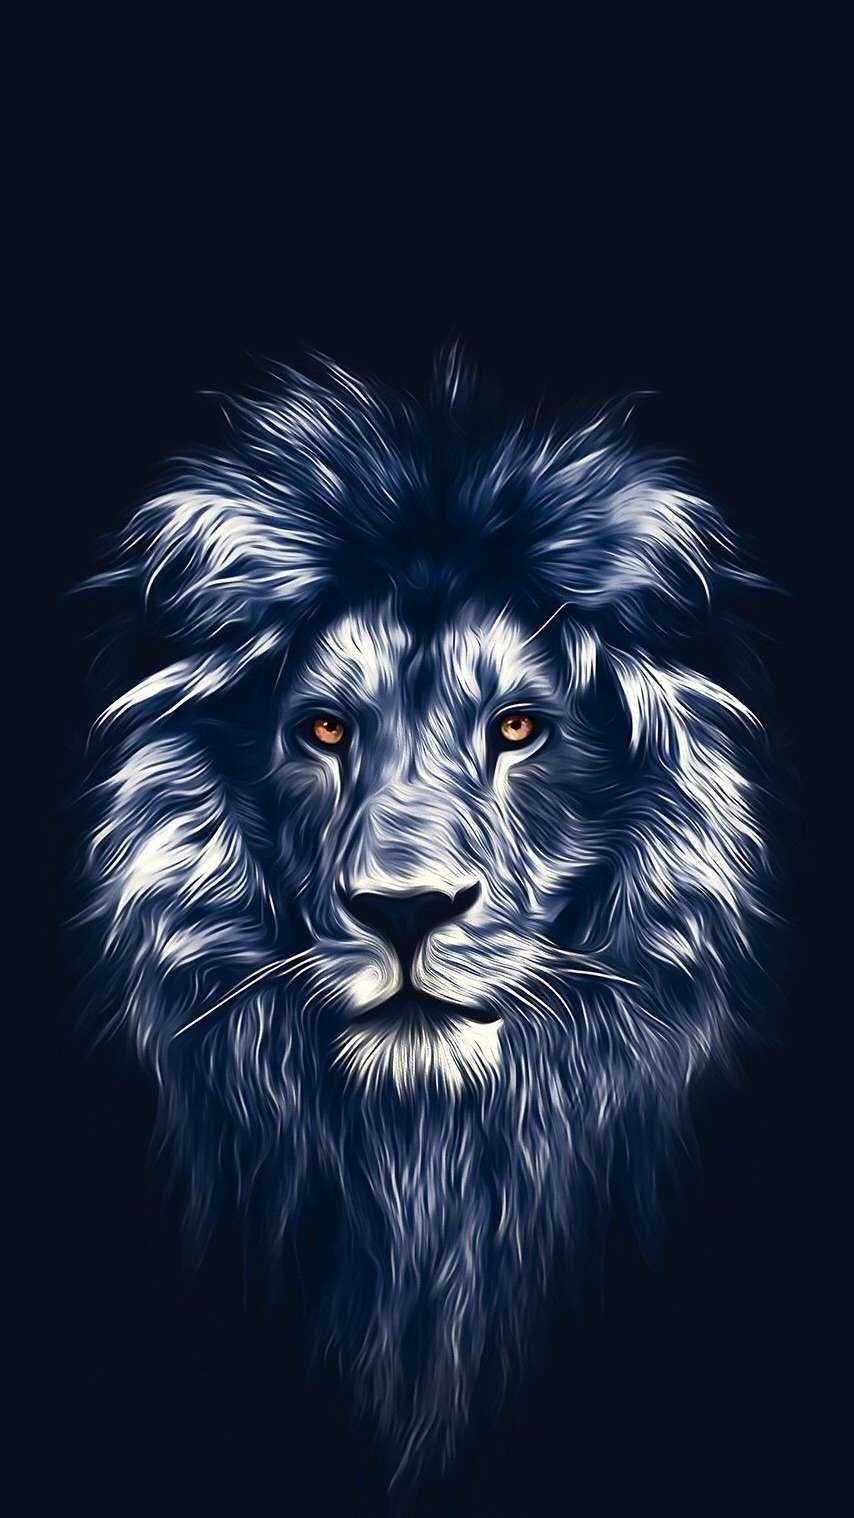 Lion Face Art iPhone Wallpaper Lion wallpaper, Lion